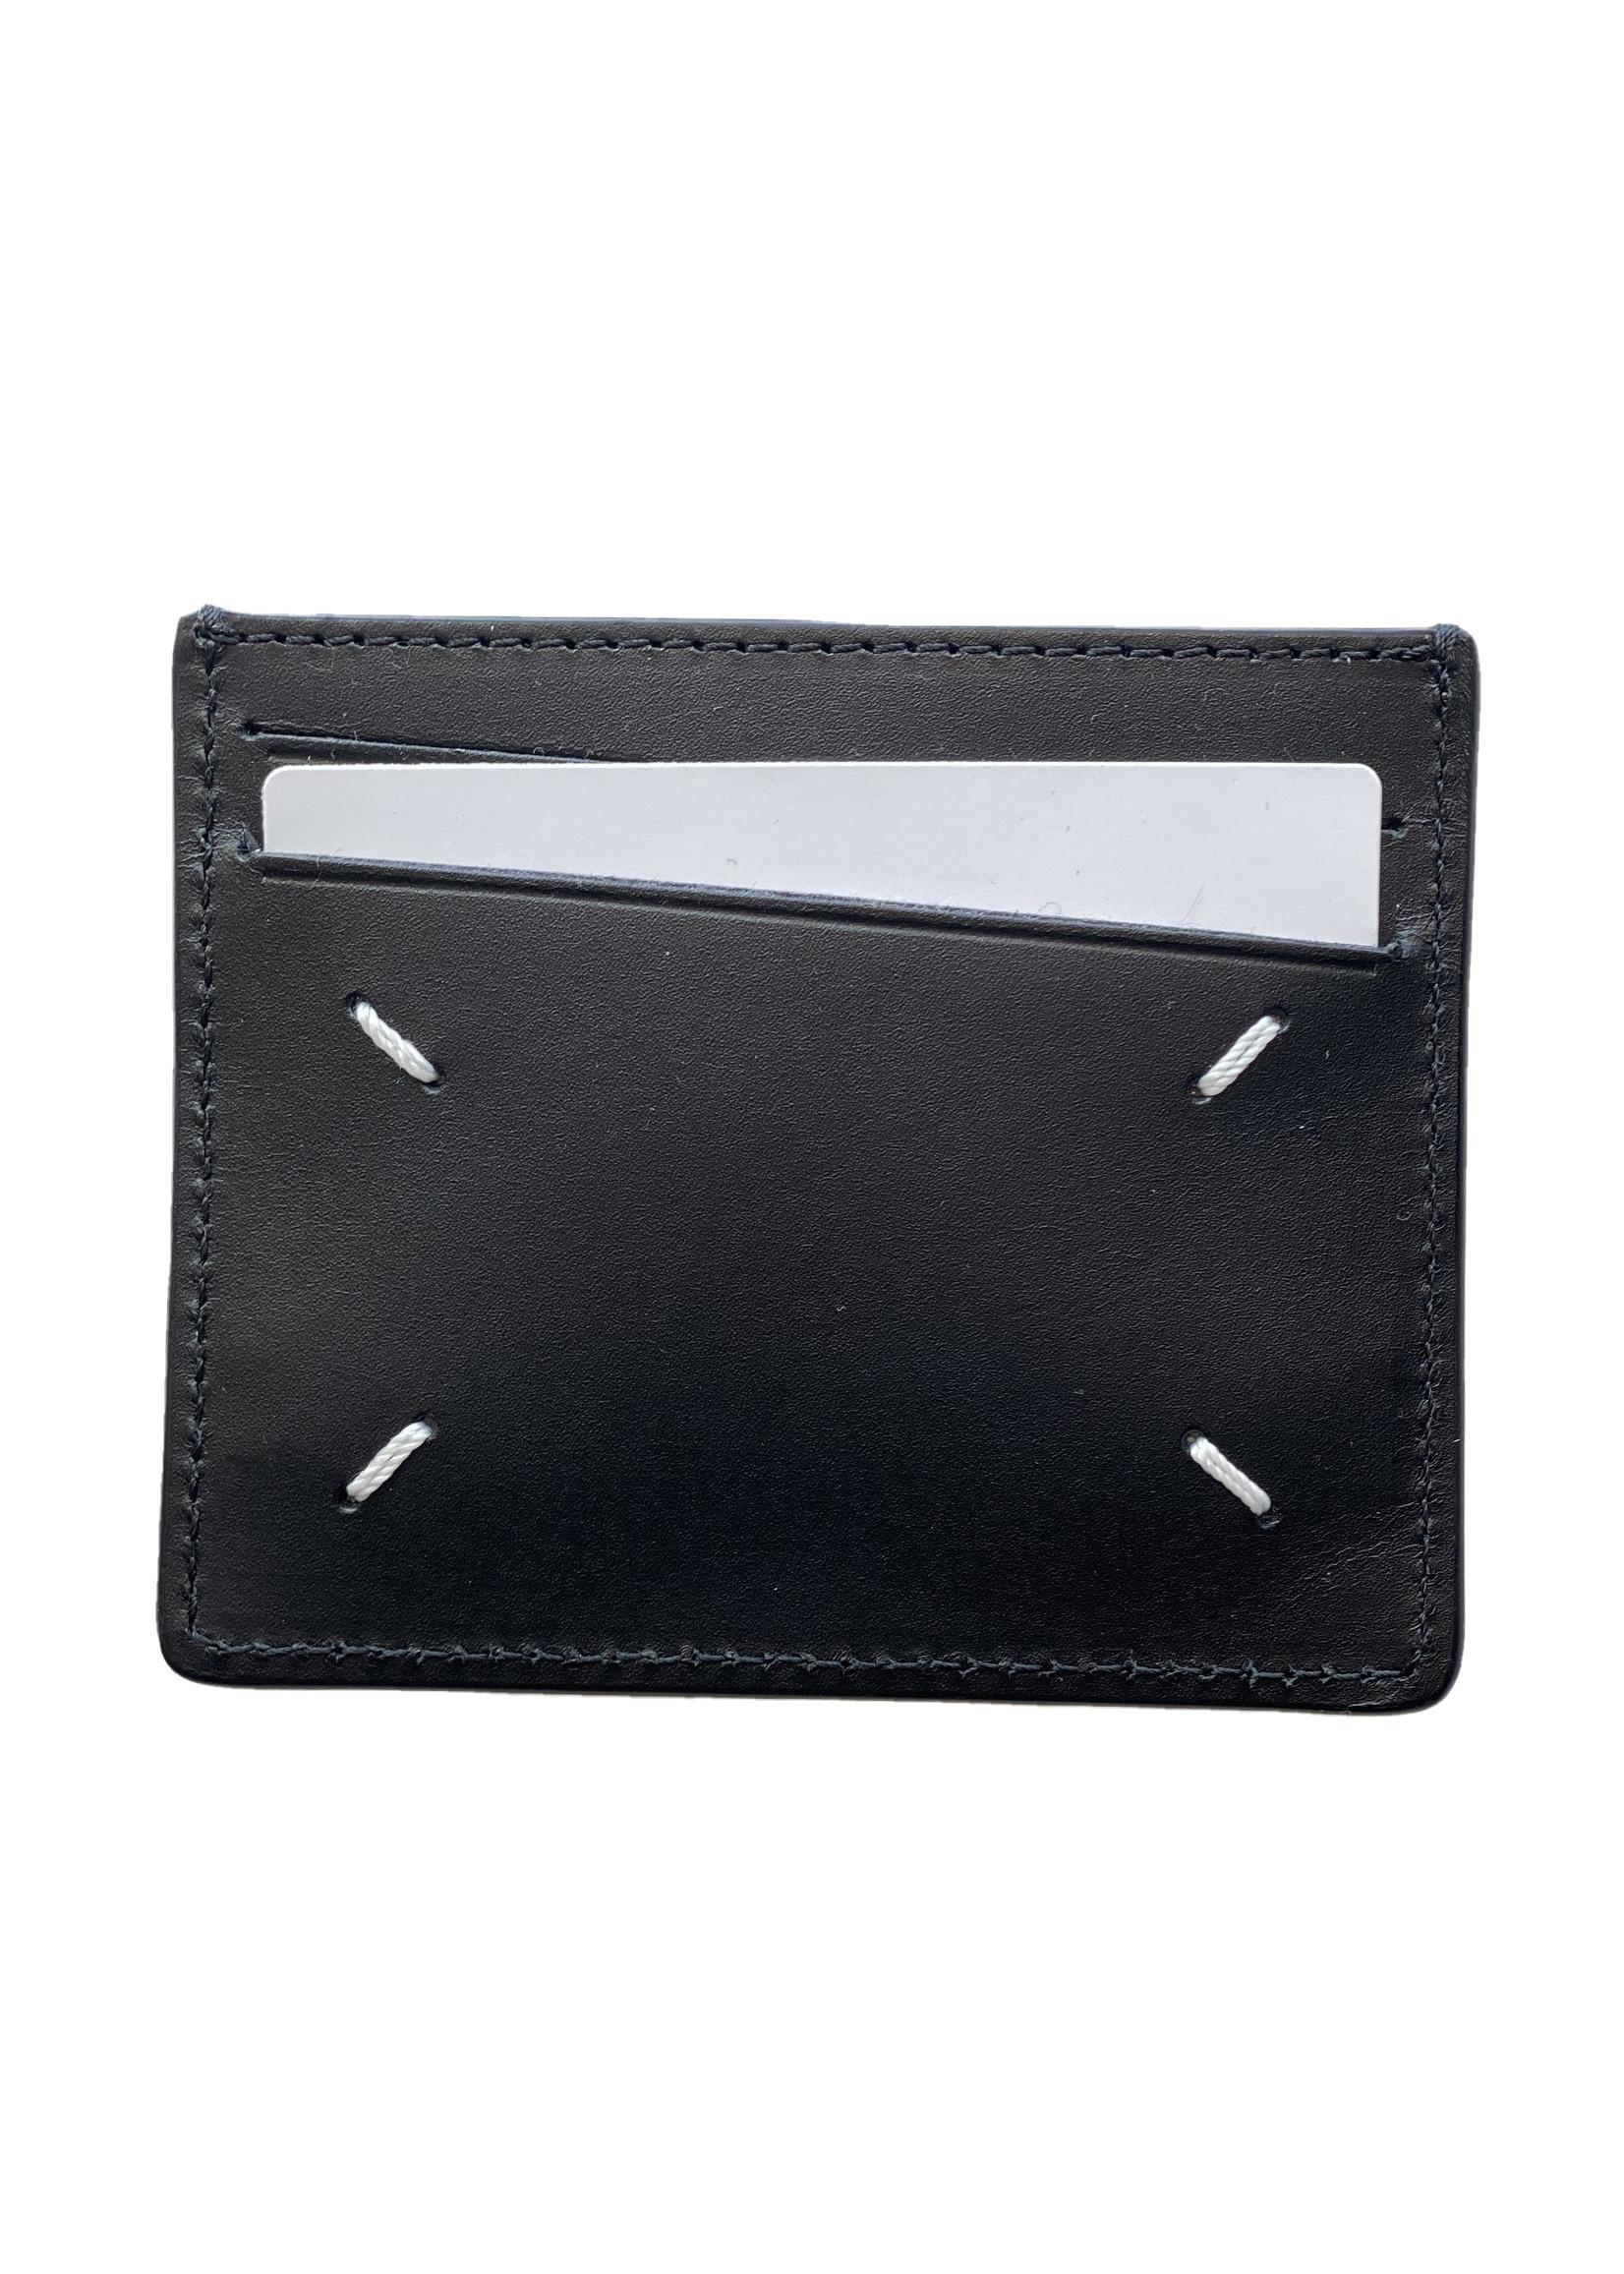 Maison Margiela 1/2 Textured Cardholder in Black